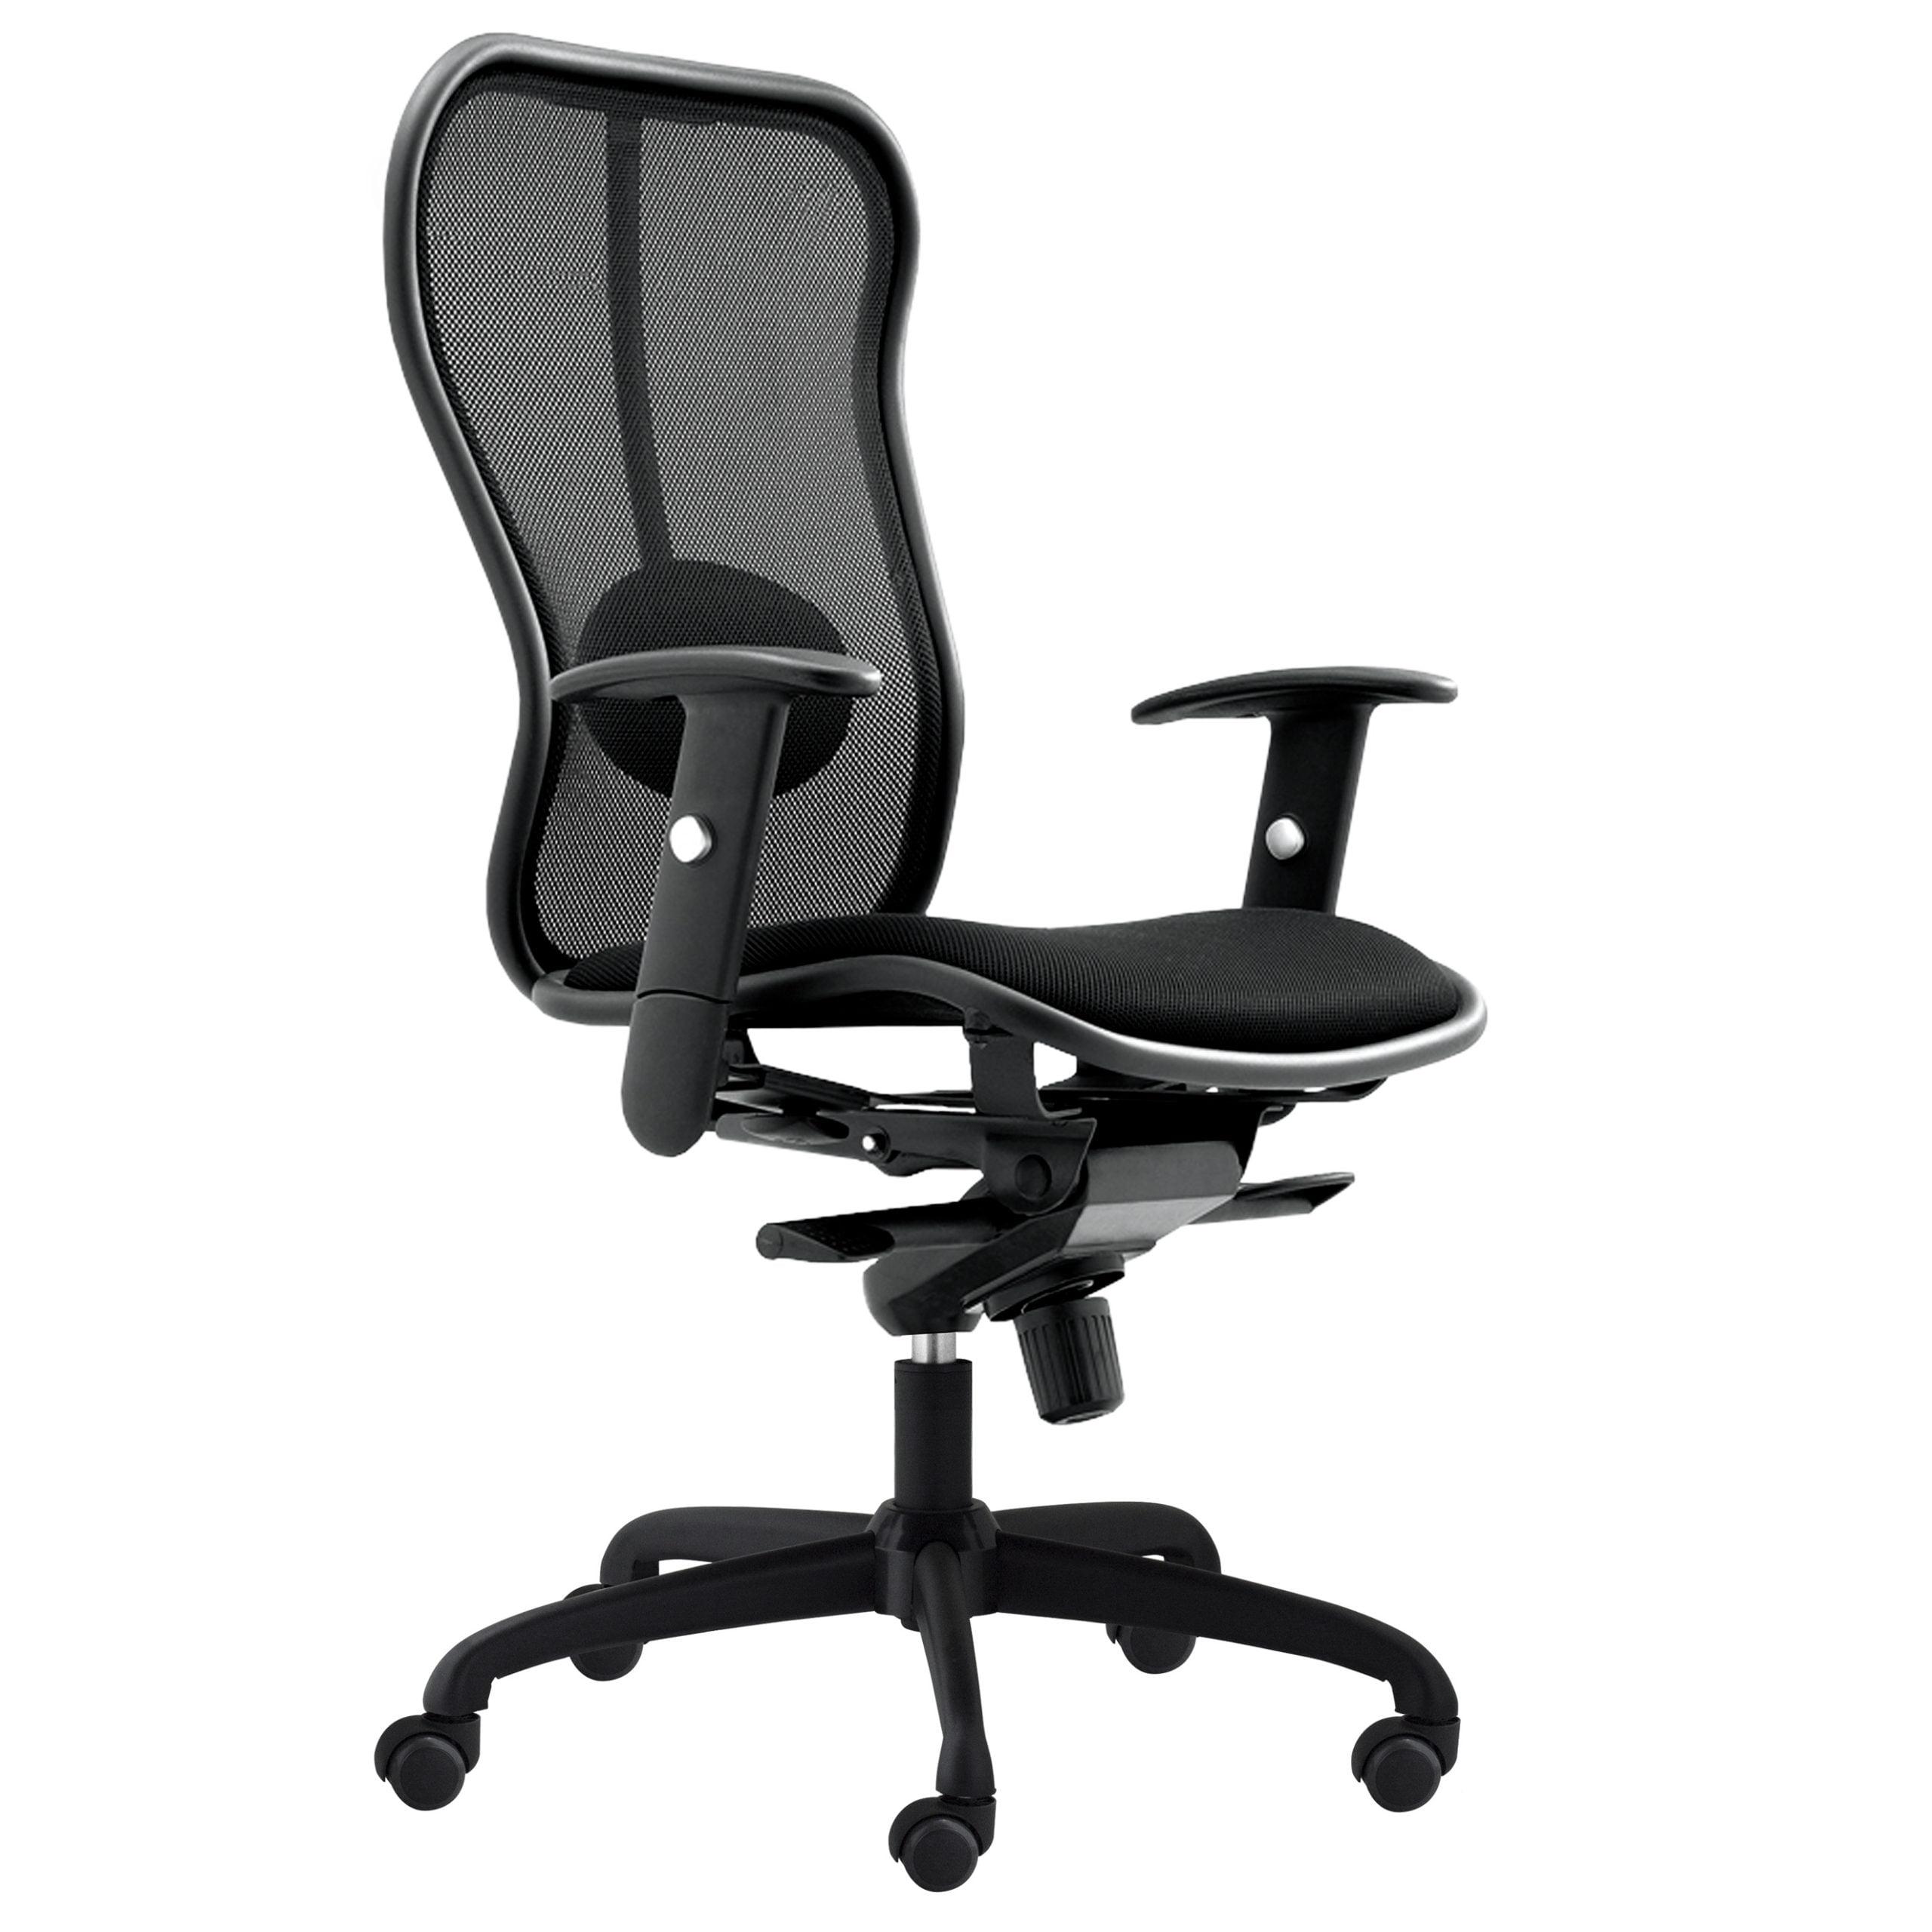 Positano II Task Chair - Black